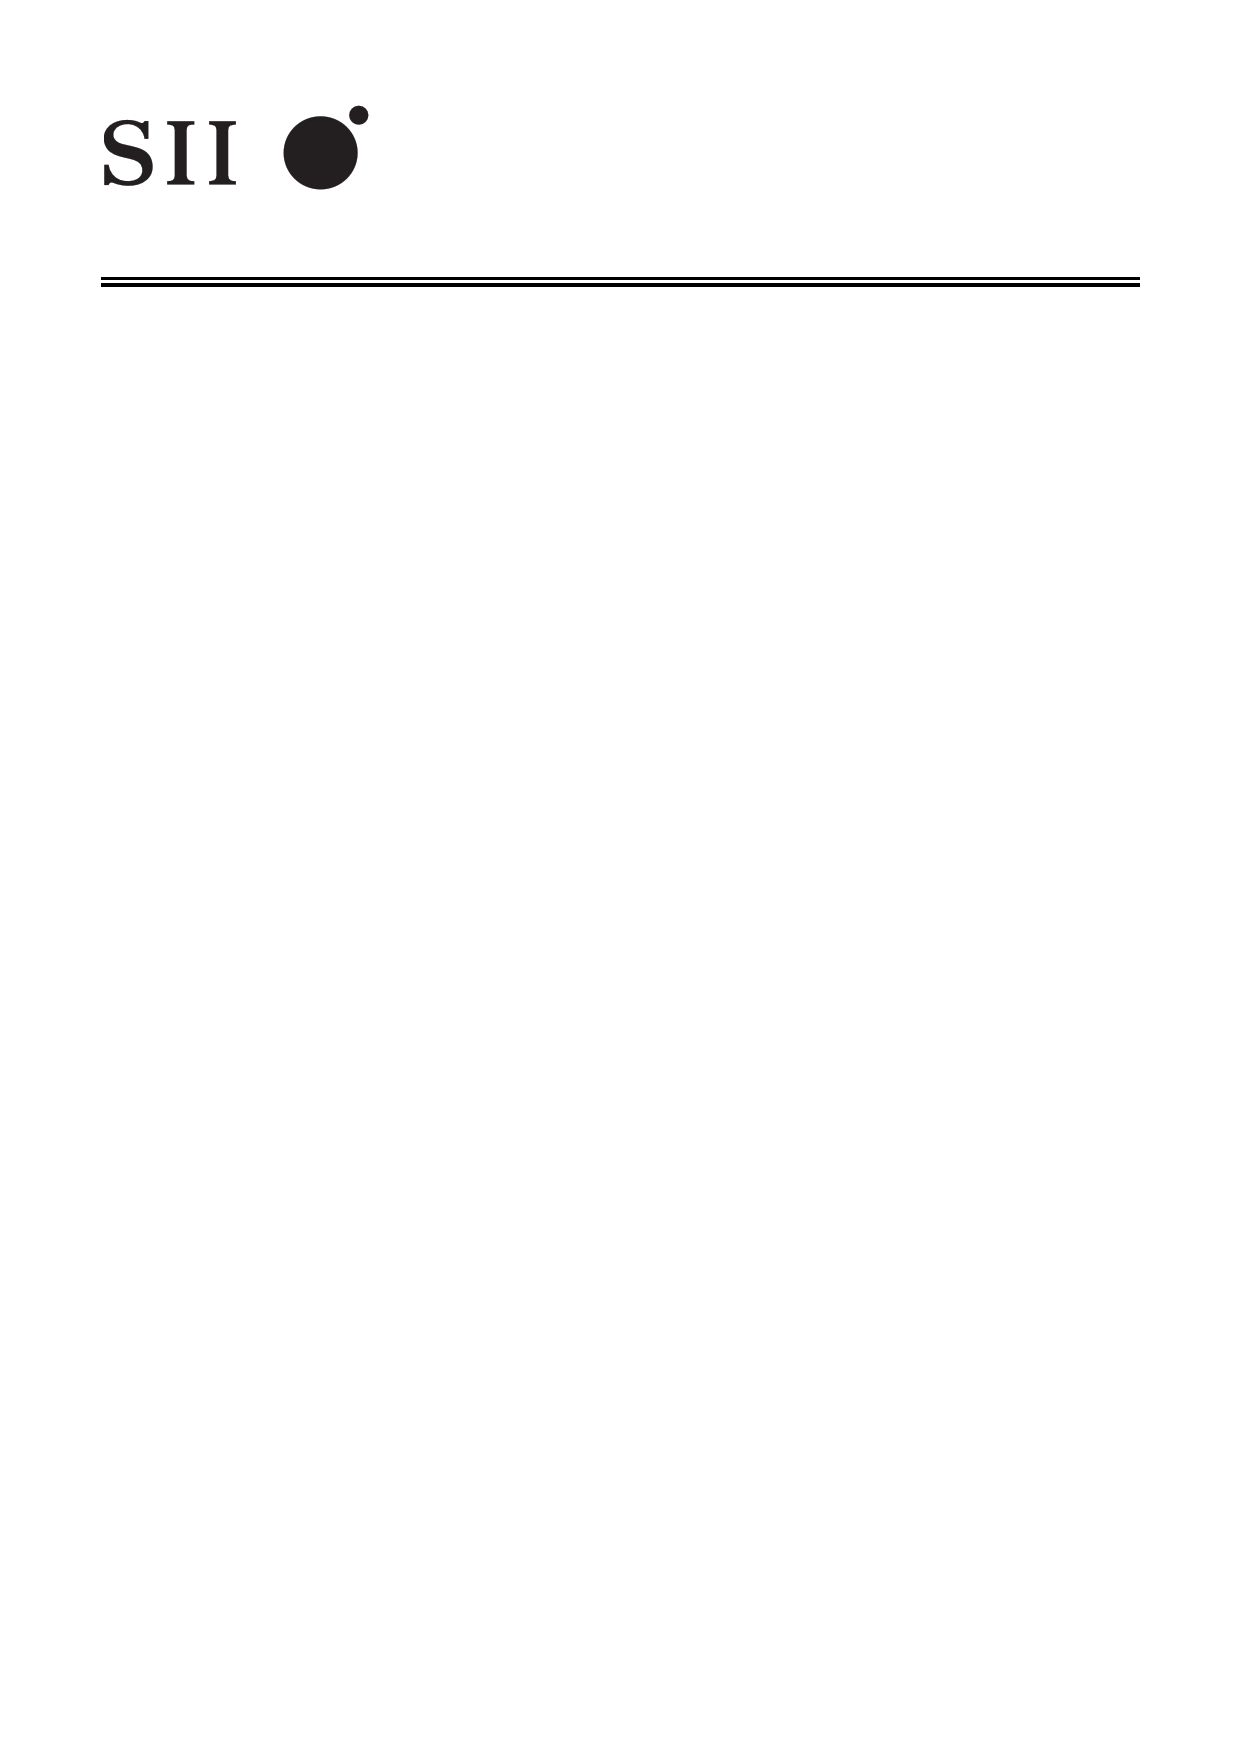 S-13R1 datasheet